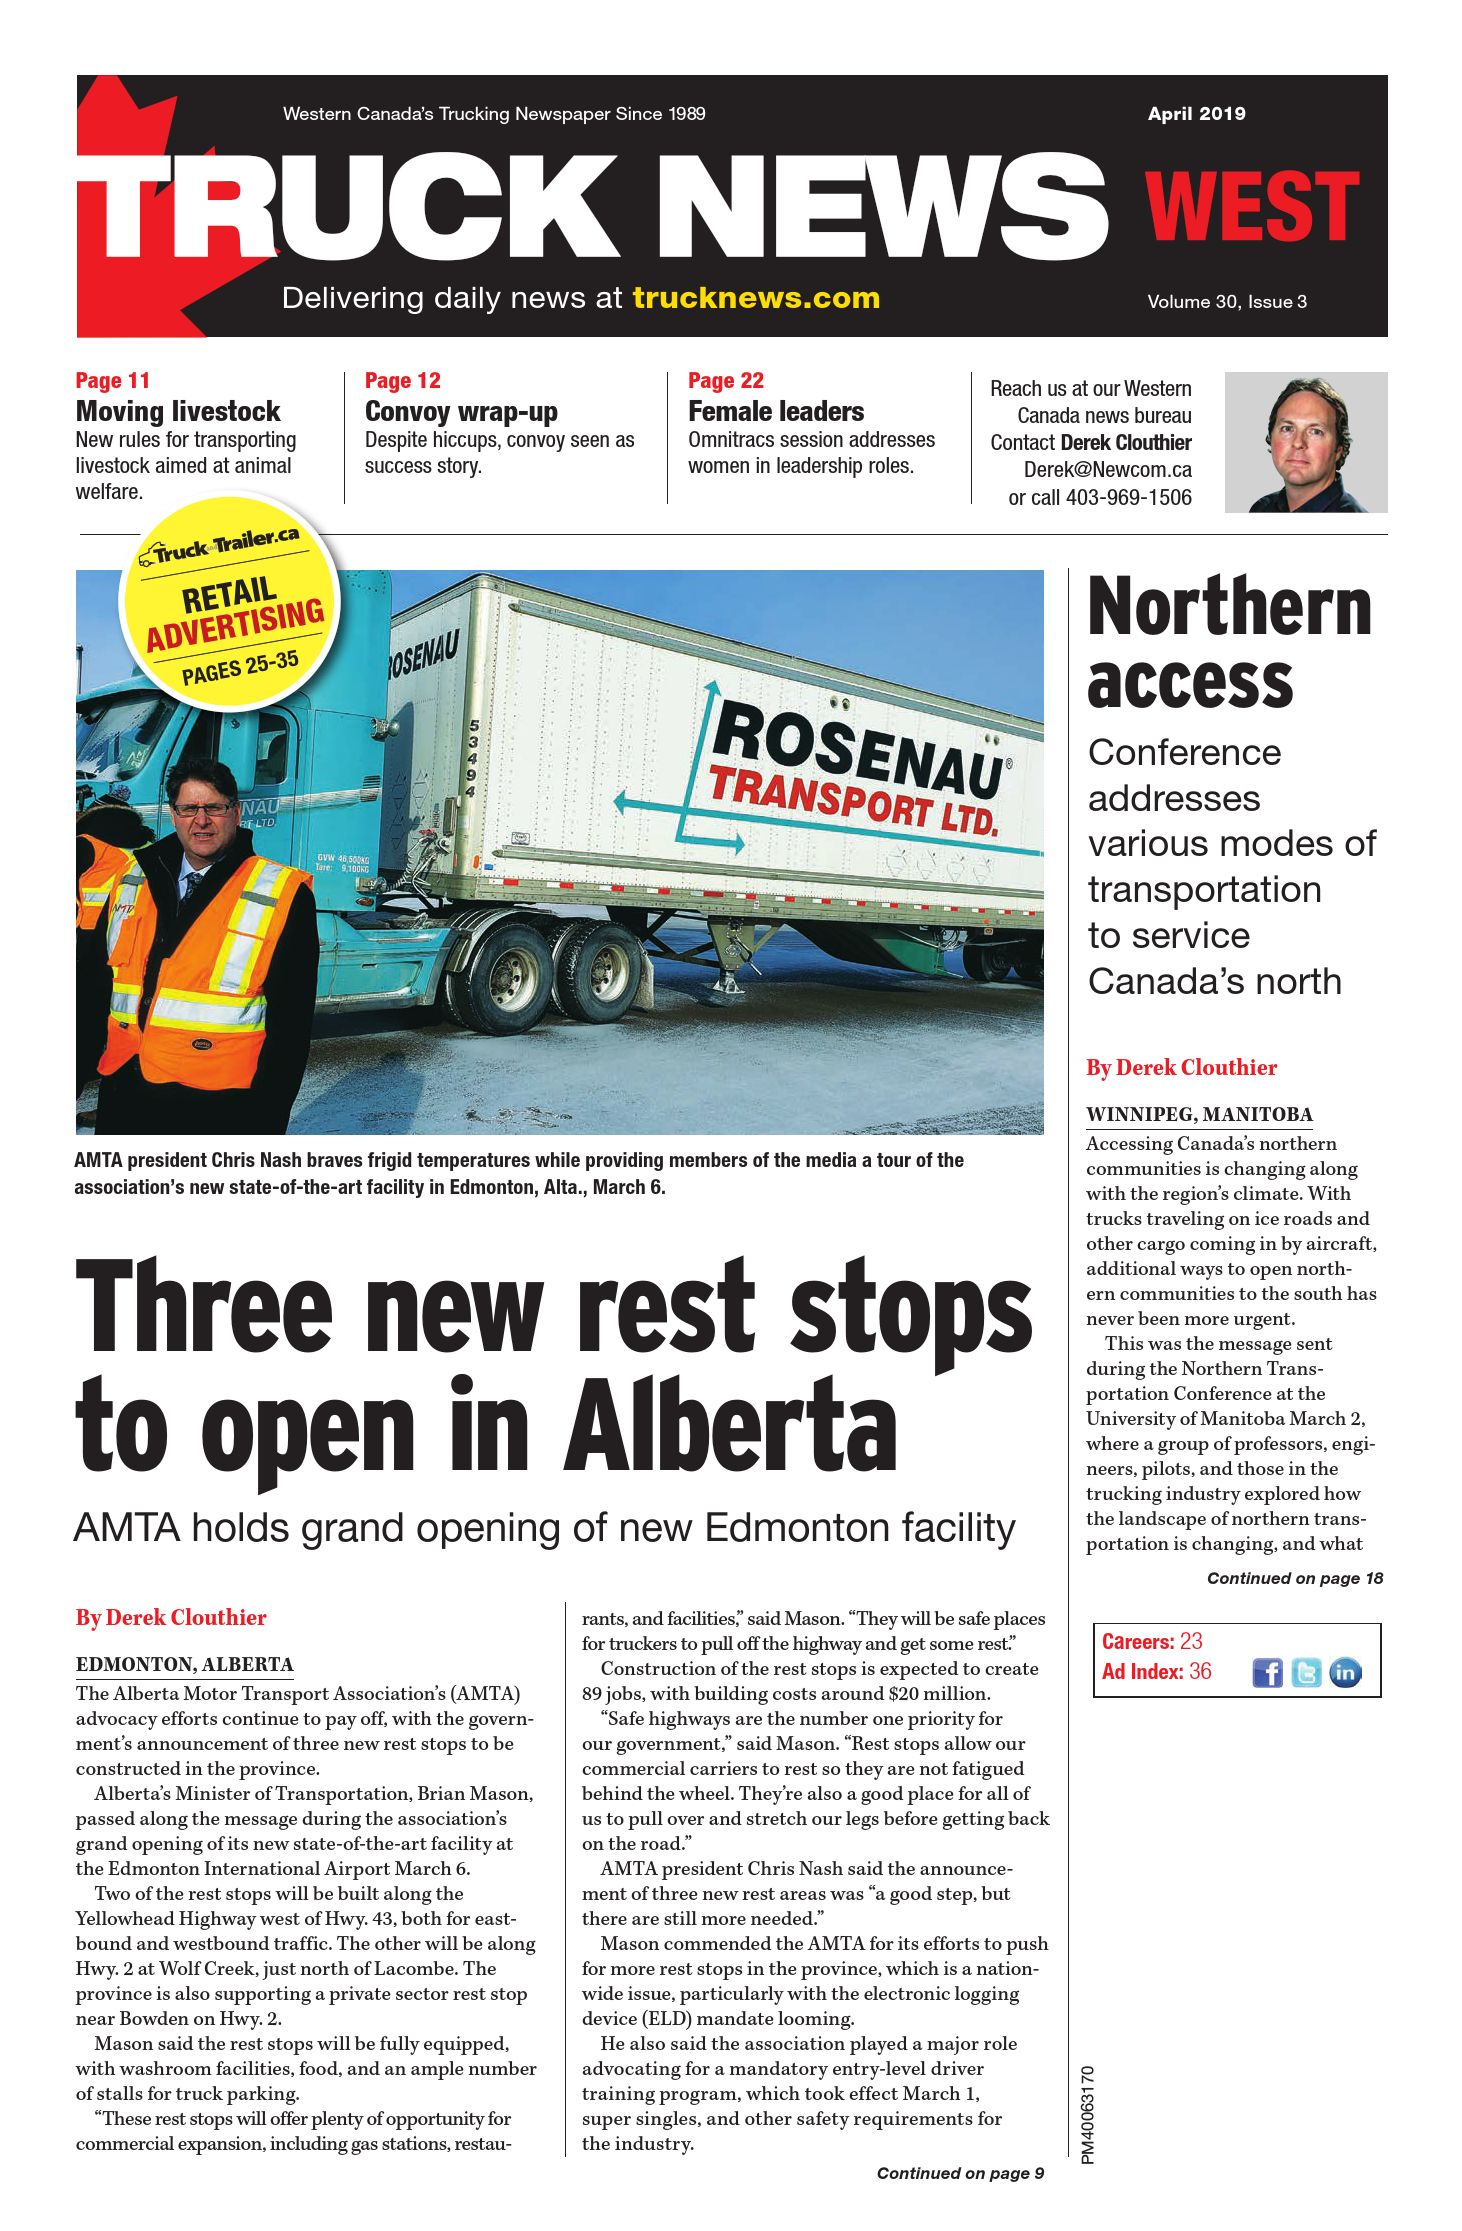 Truck News West – 1 avril 2019